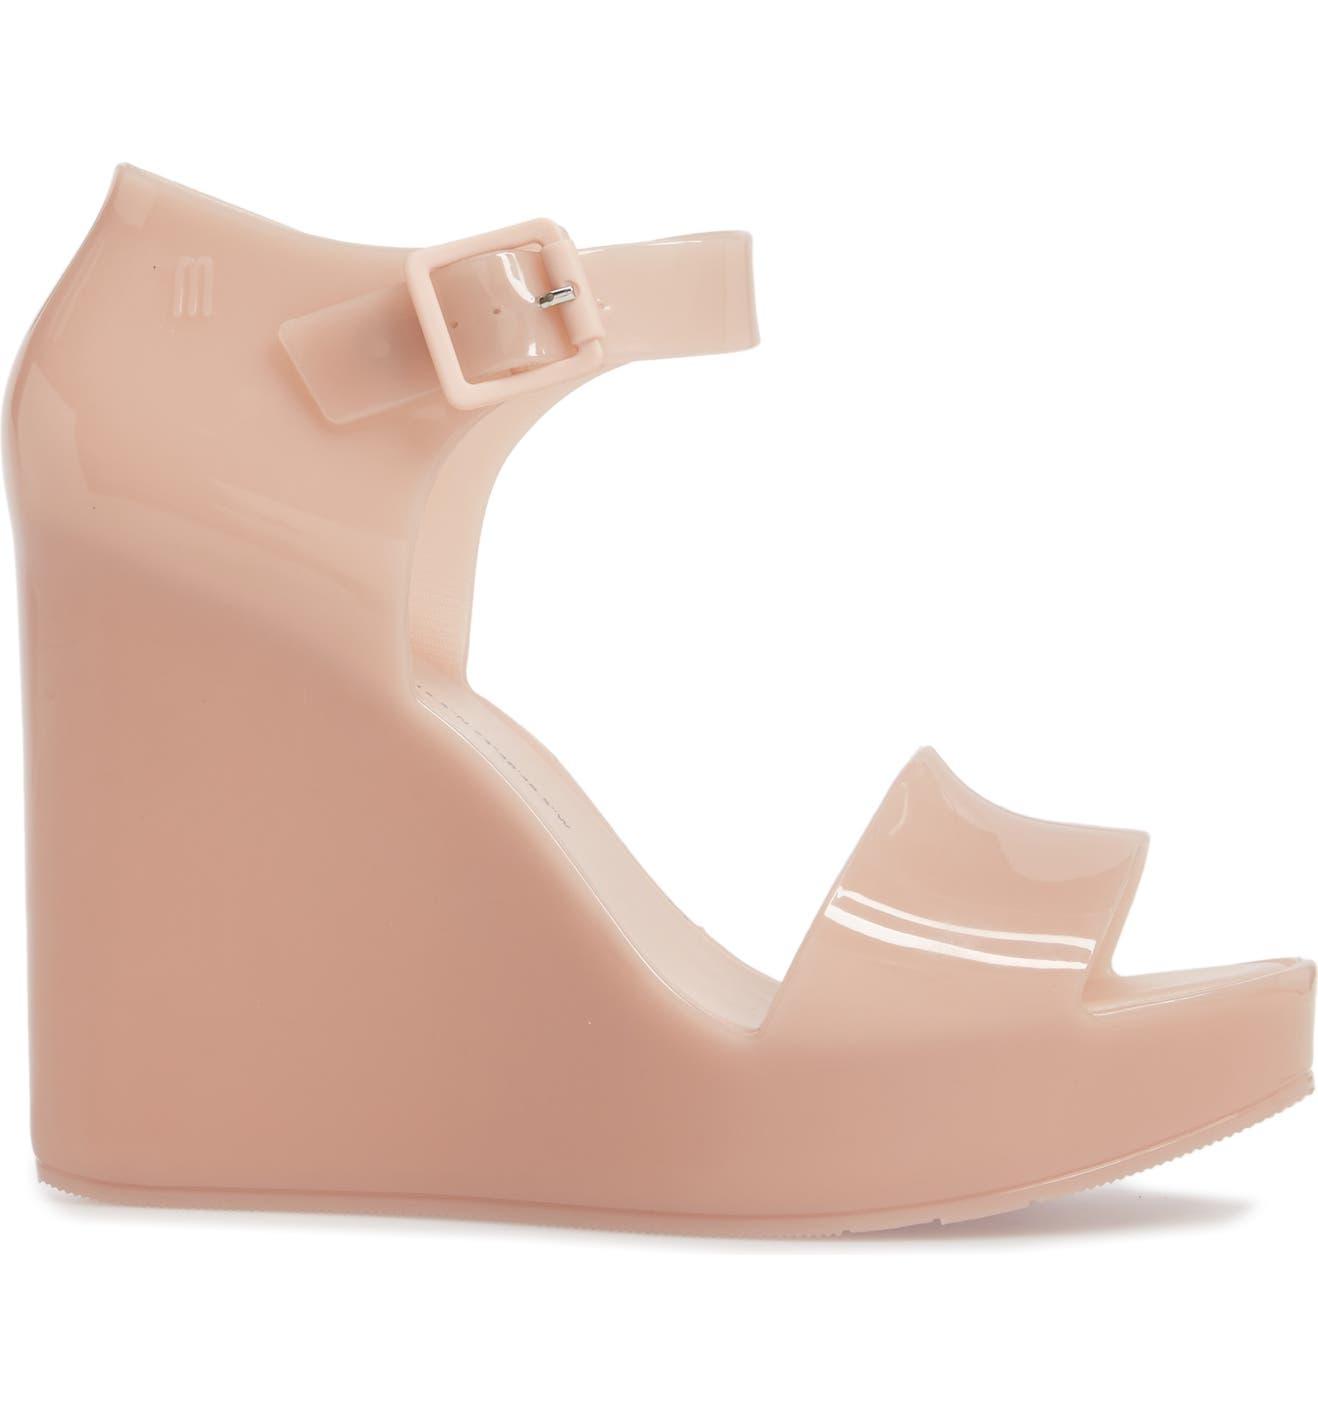 35e7b762c55 Melissa Mar Platform Wedge Sandal